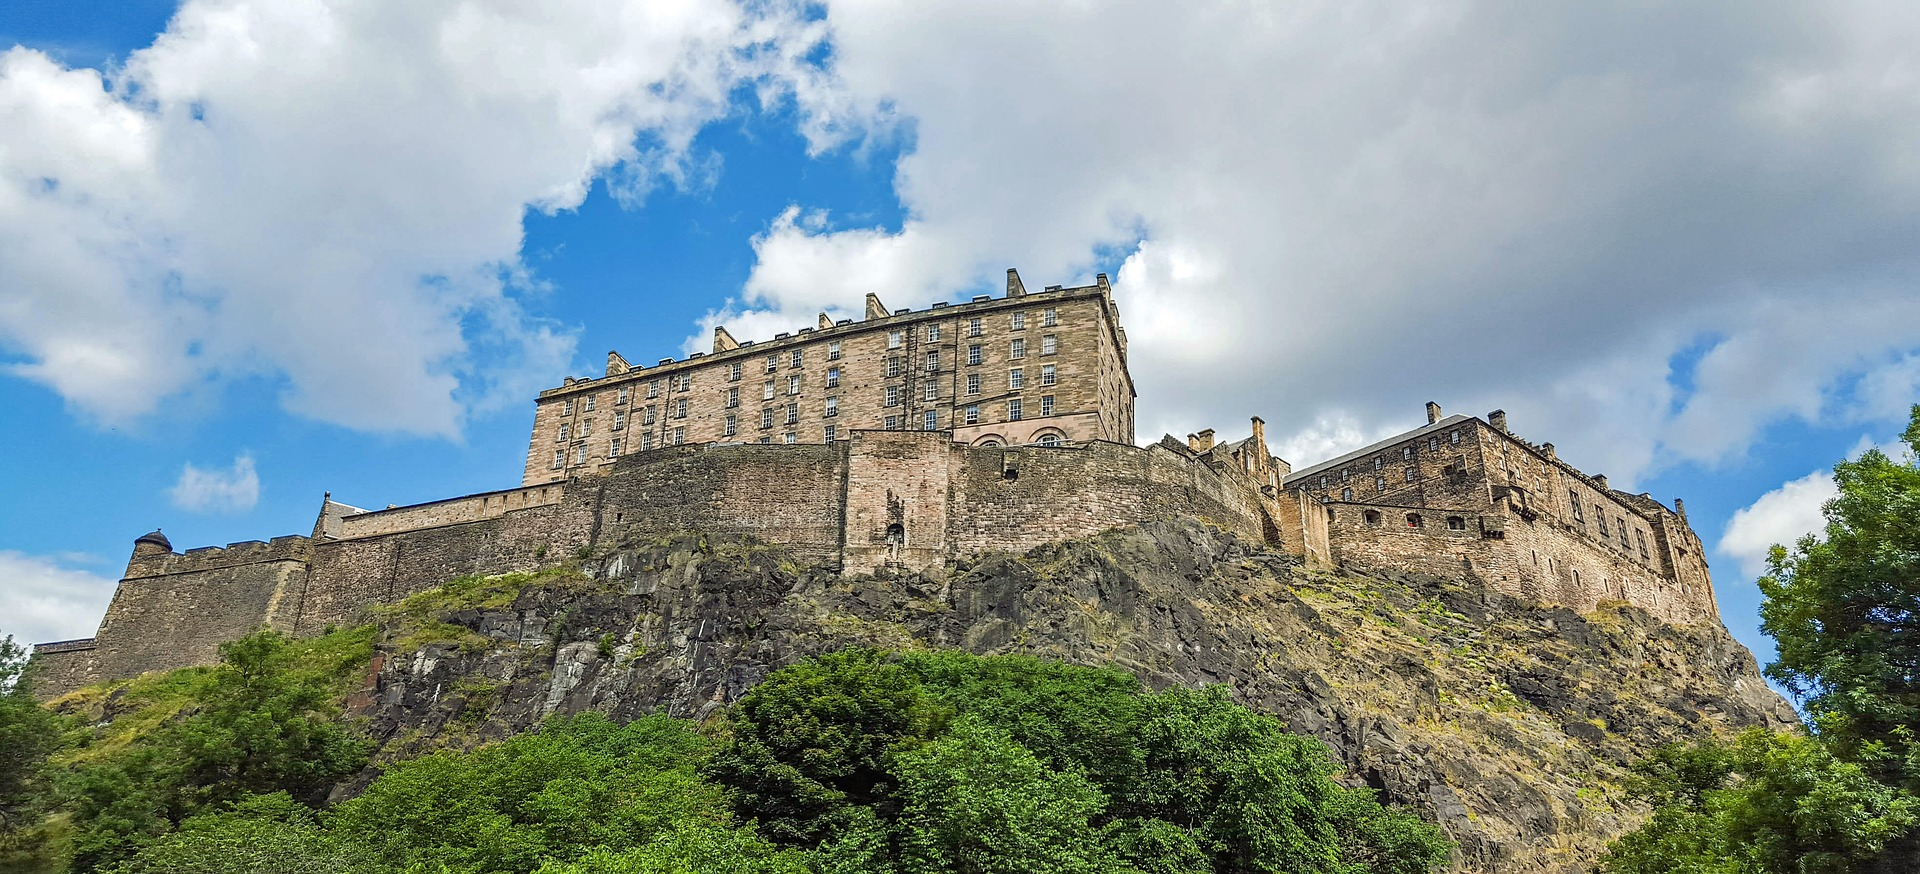 scotland-1607903_1920